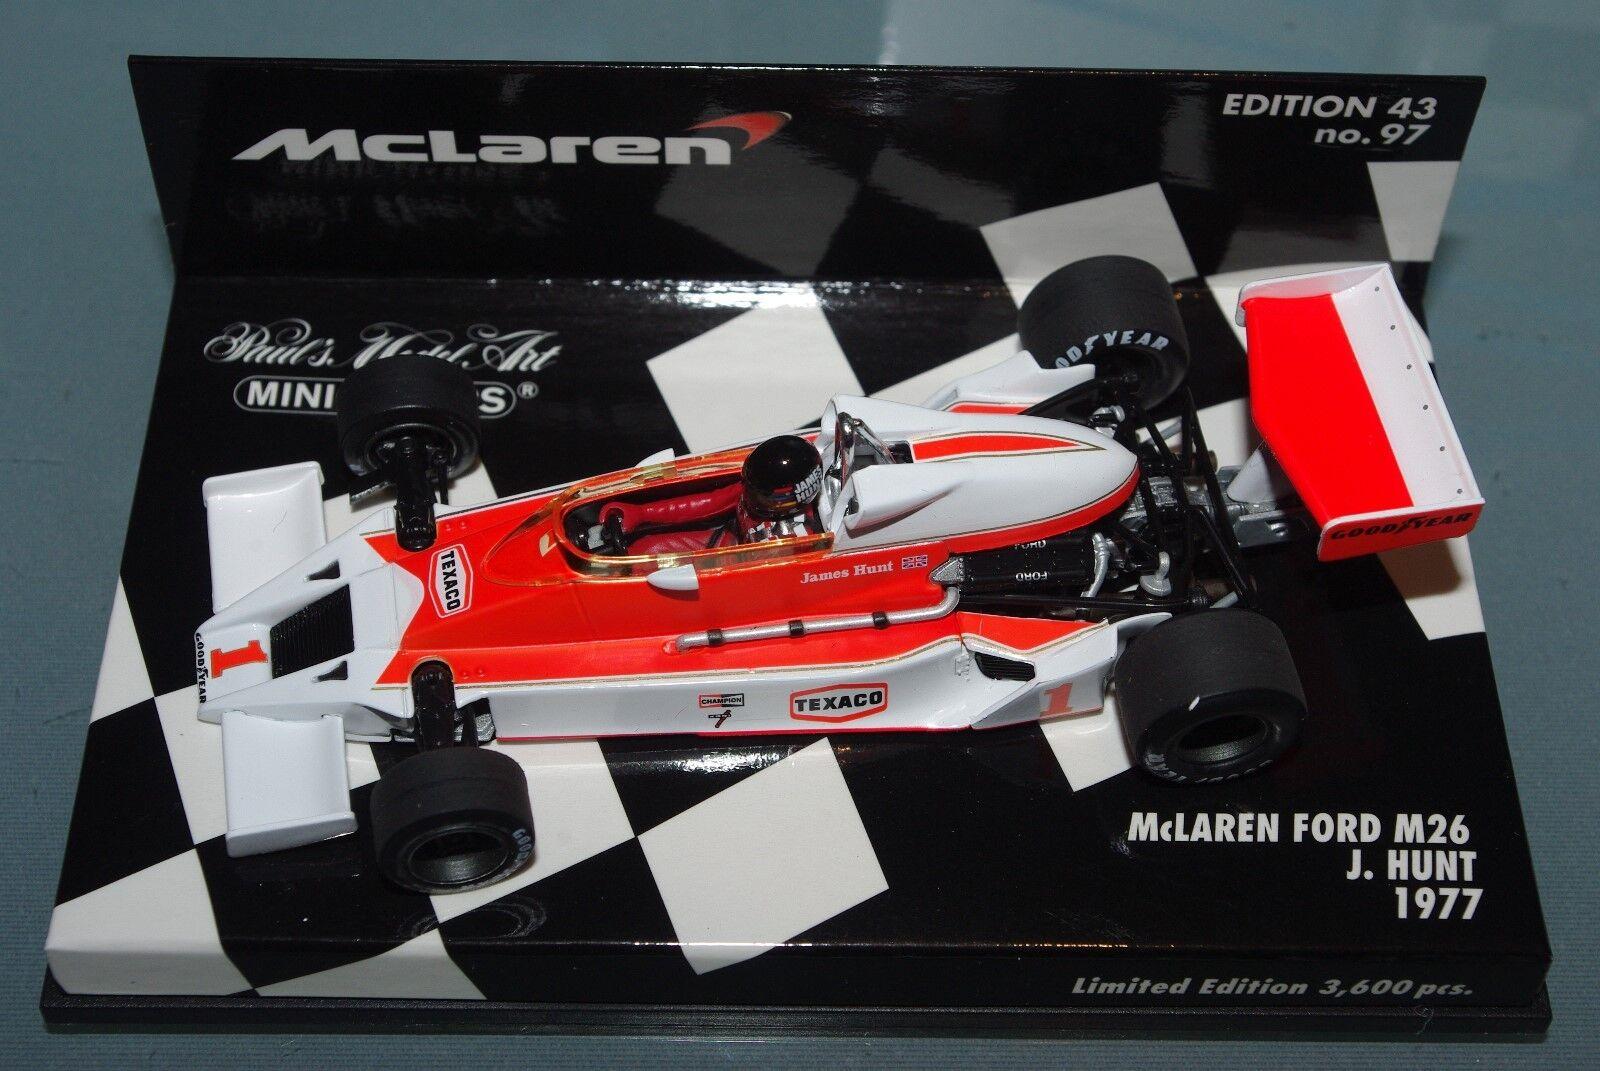 punto de venta barato Minichamps 1 43 F1 F1 F1 McLaren Ford M26-James Hunt 1977-Edición Limitada 3600 un.  edición limitada